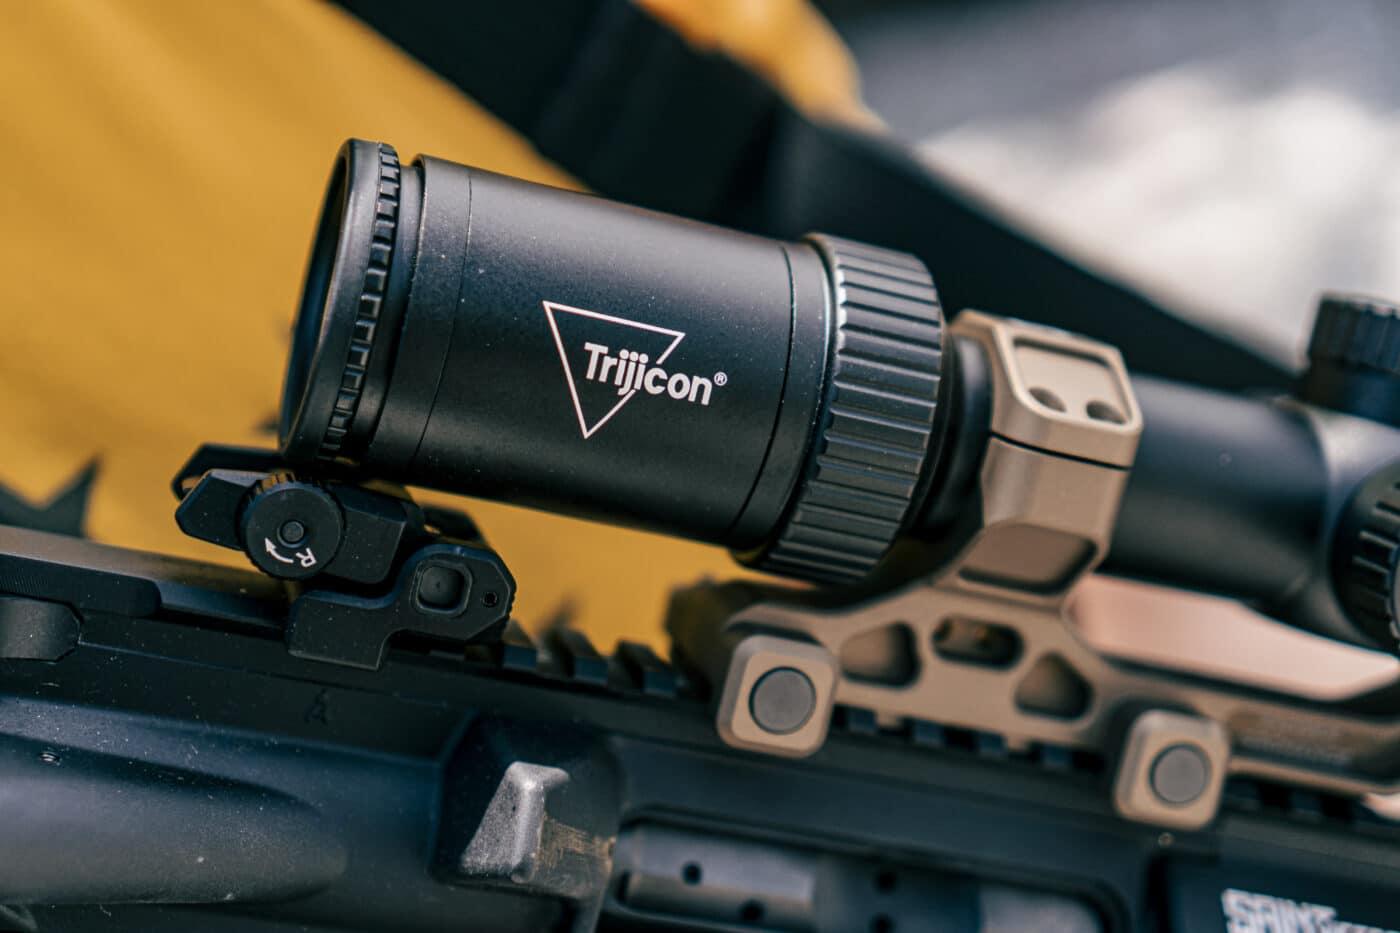 Trijicon hunting scope